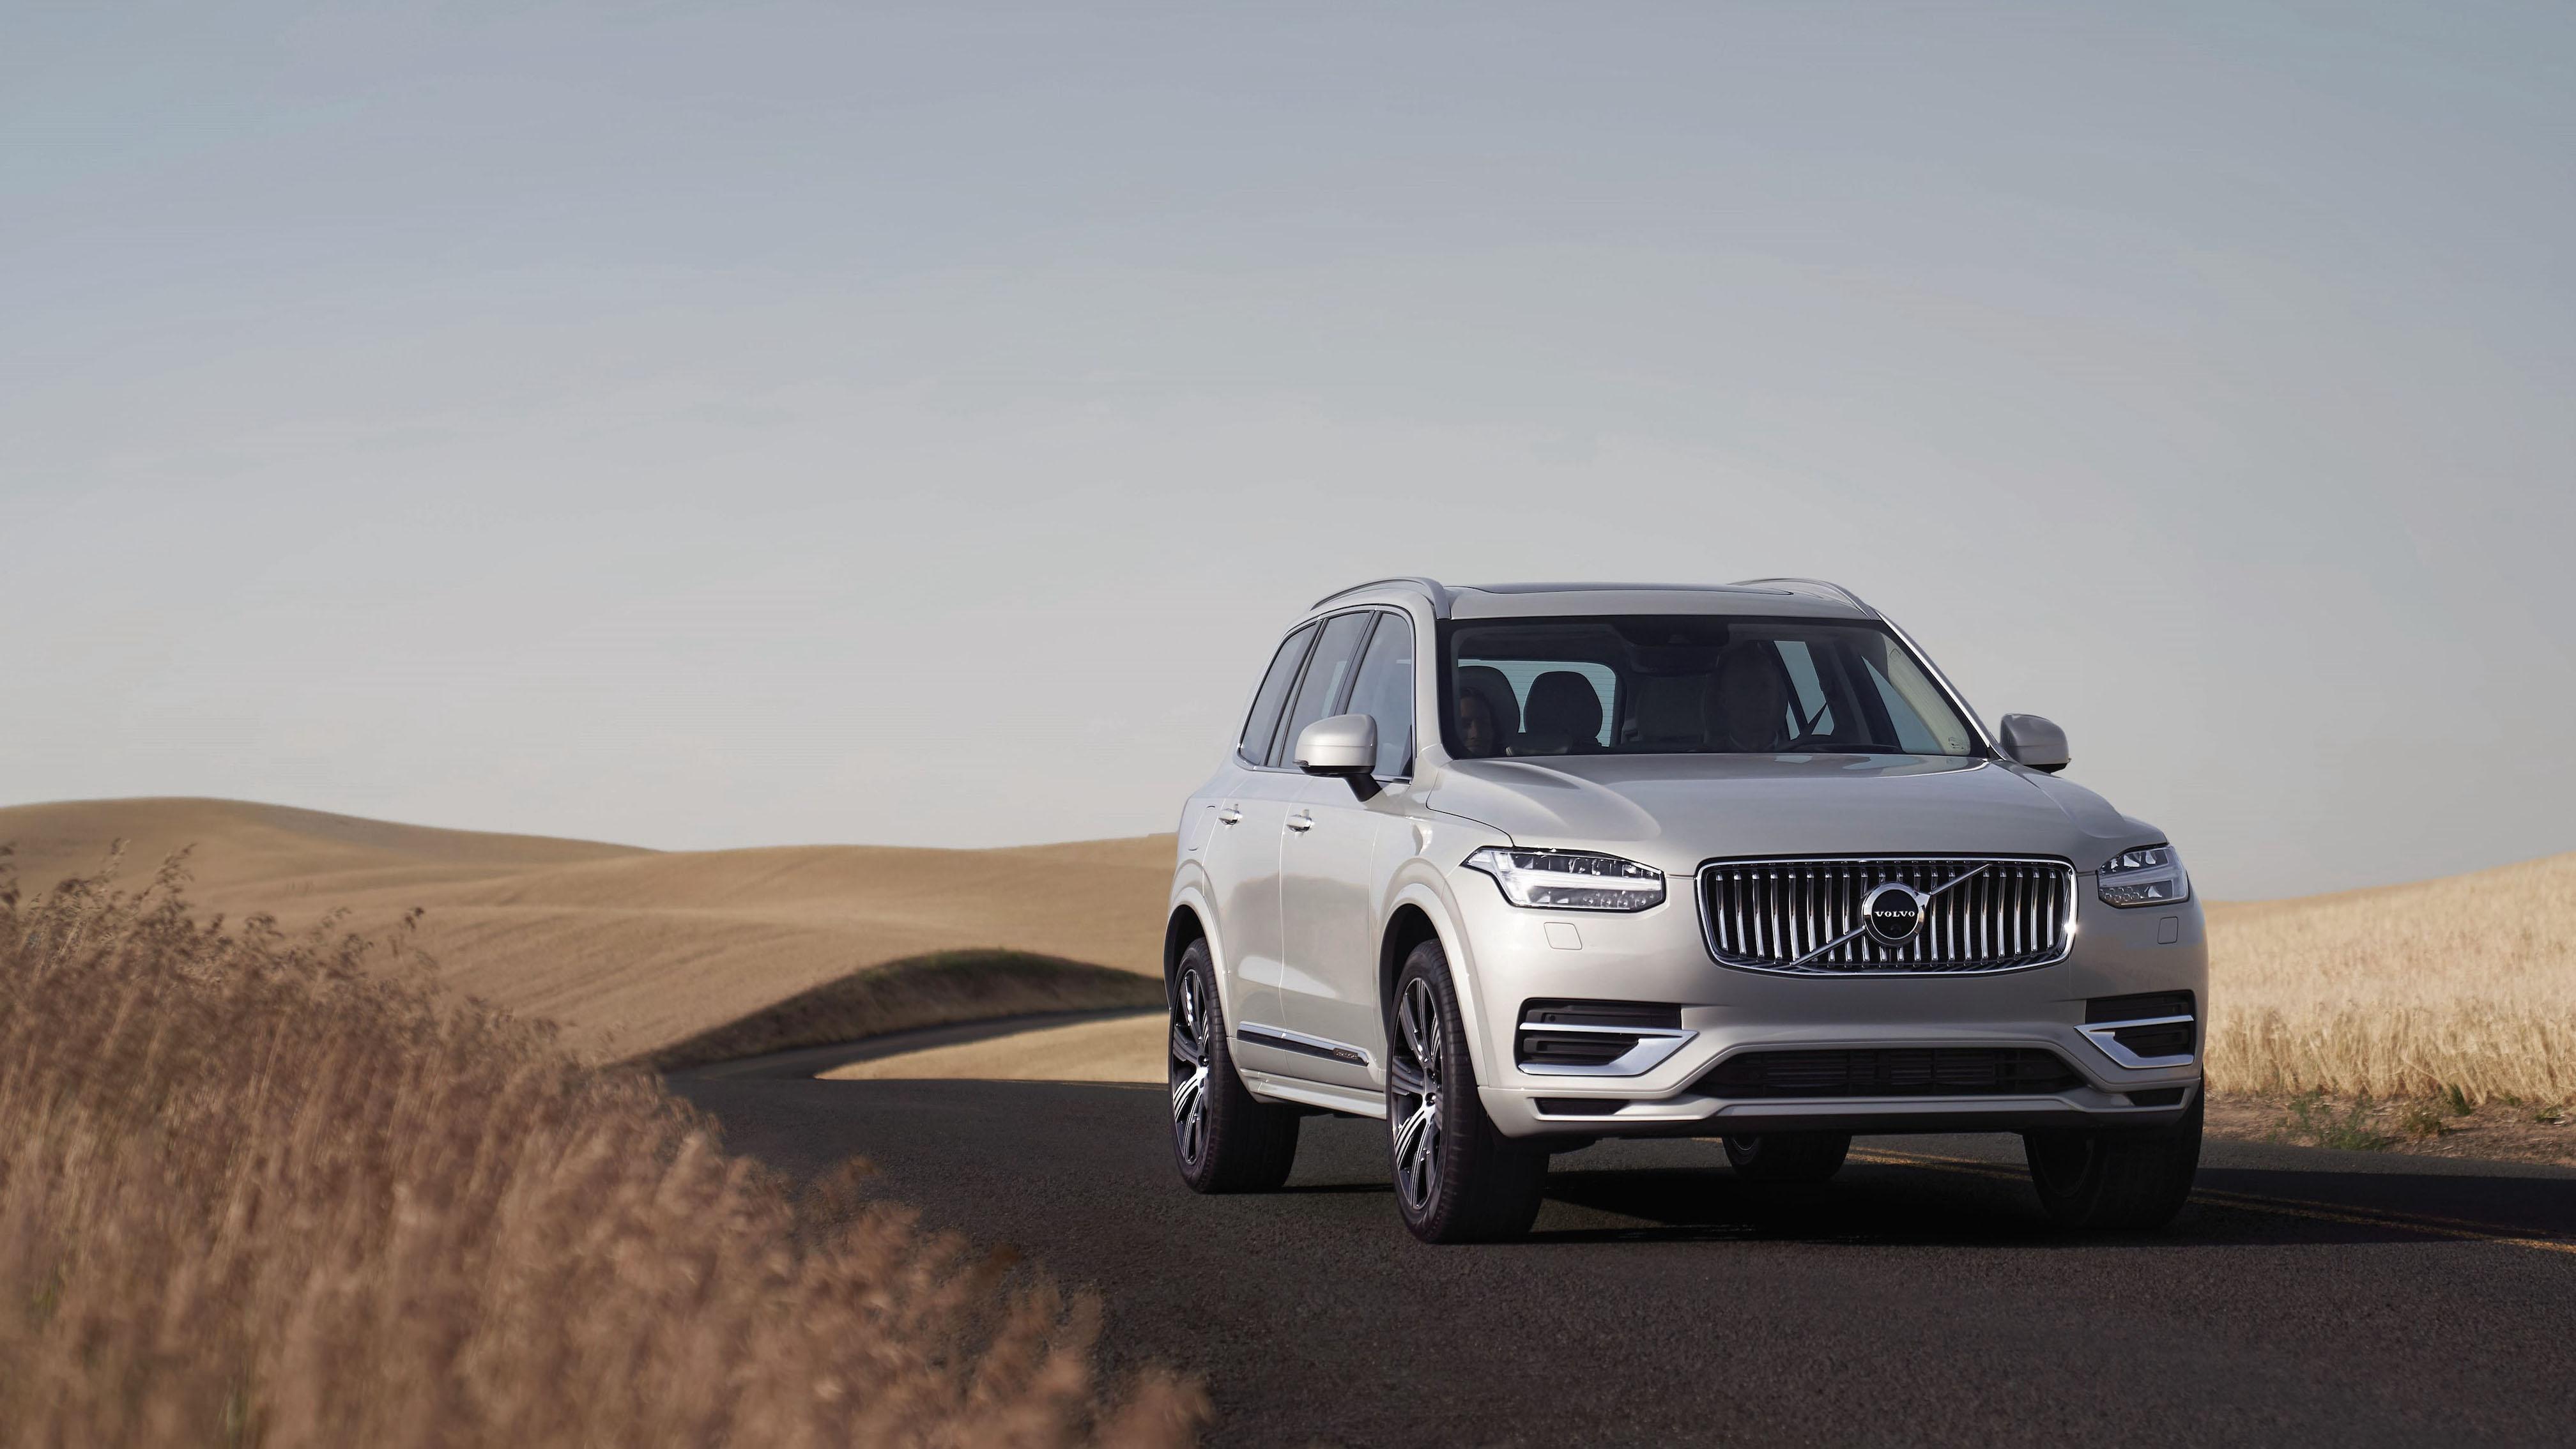 安全第一!Volvo 共九款車獲 IIHS 最高安全精選獎